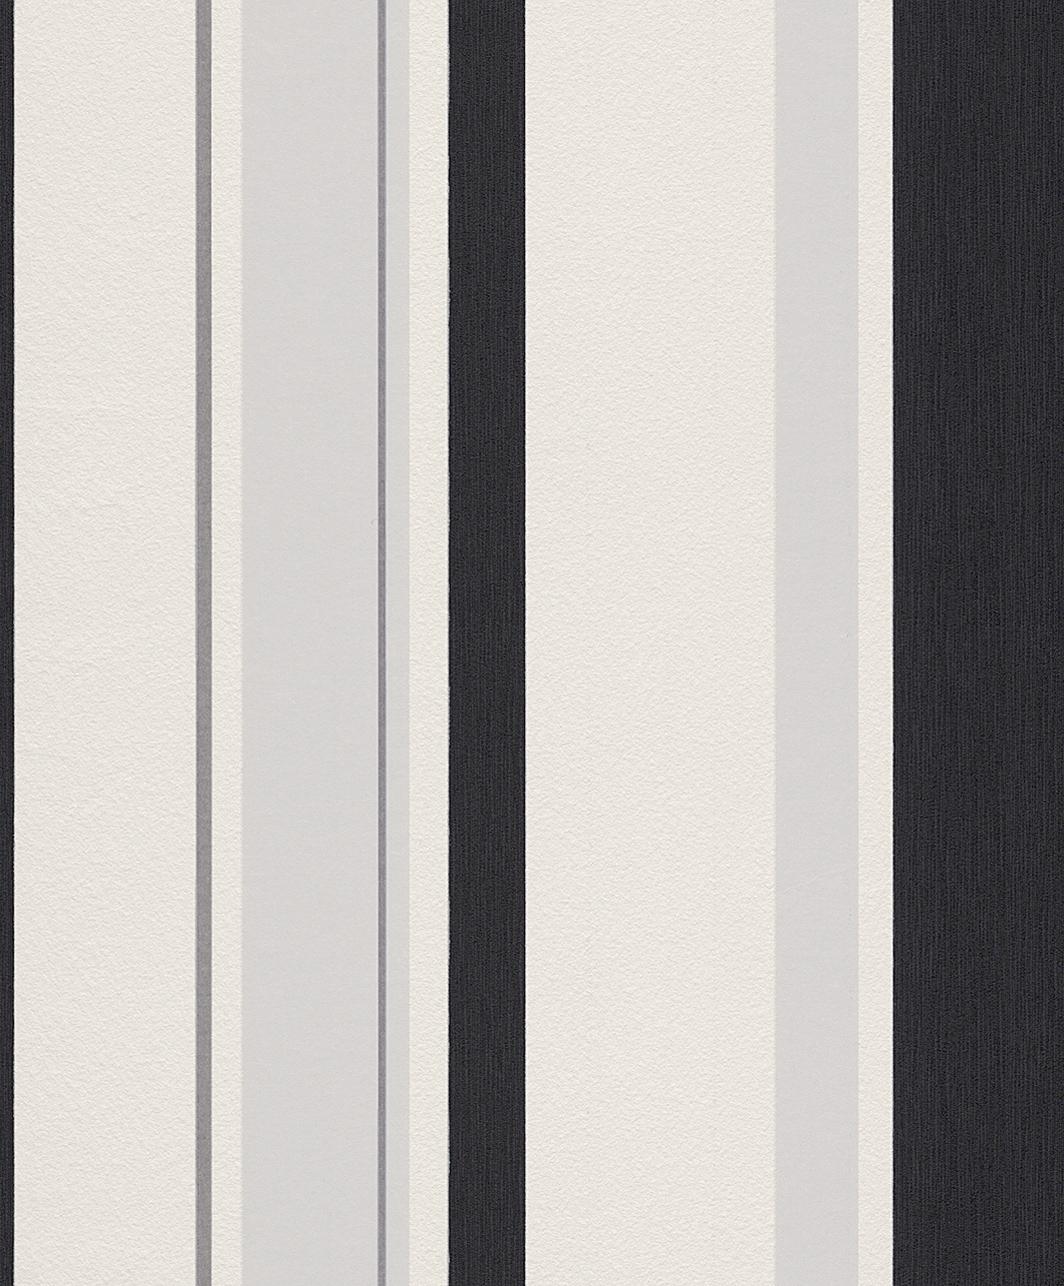 rasch tapete new beats 719246 vliestapete retro neu. Black Bedroom Furniture Sets. Home Design Ideas